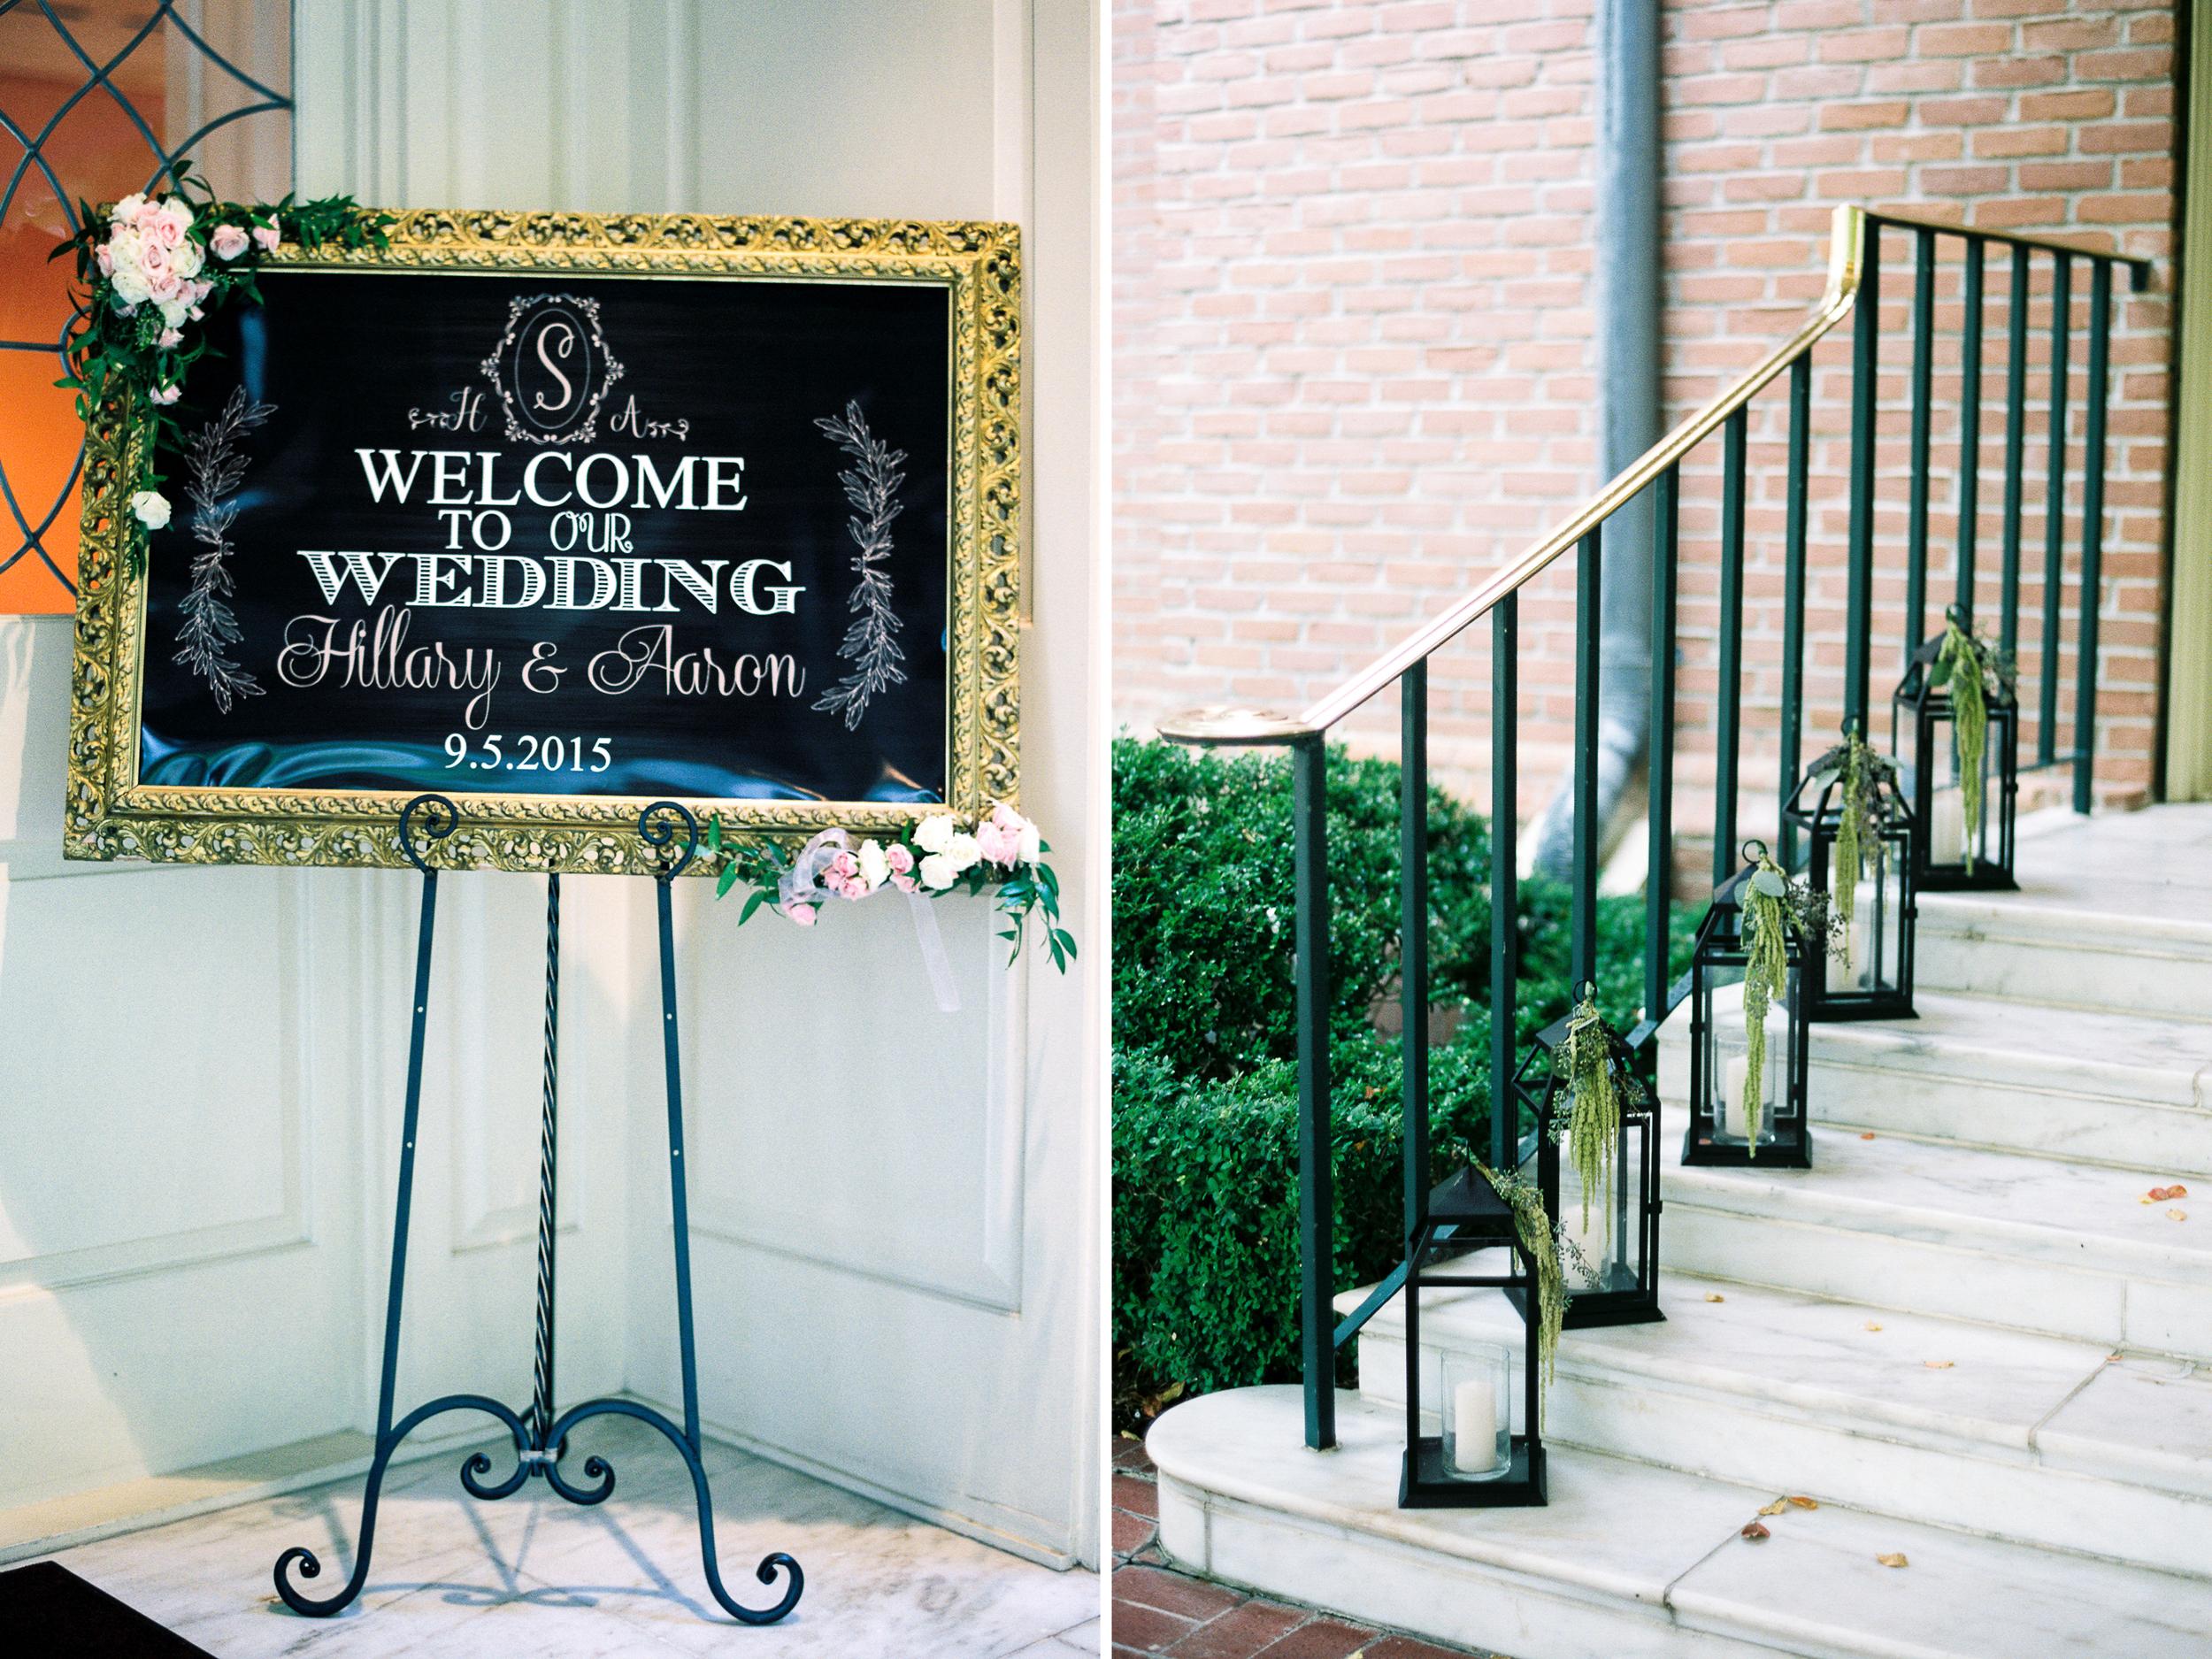 Dana-Fernandez-Photography-Weddings-in-Houston-Magazine-feature-Houston-wedding-photographer-film-141.jpg